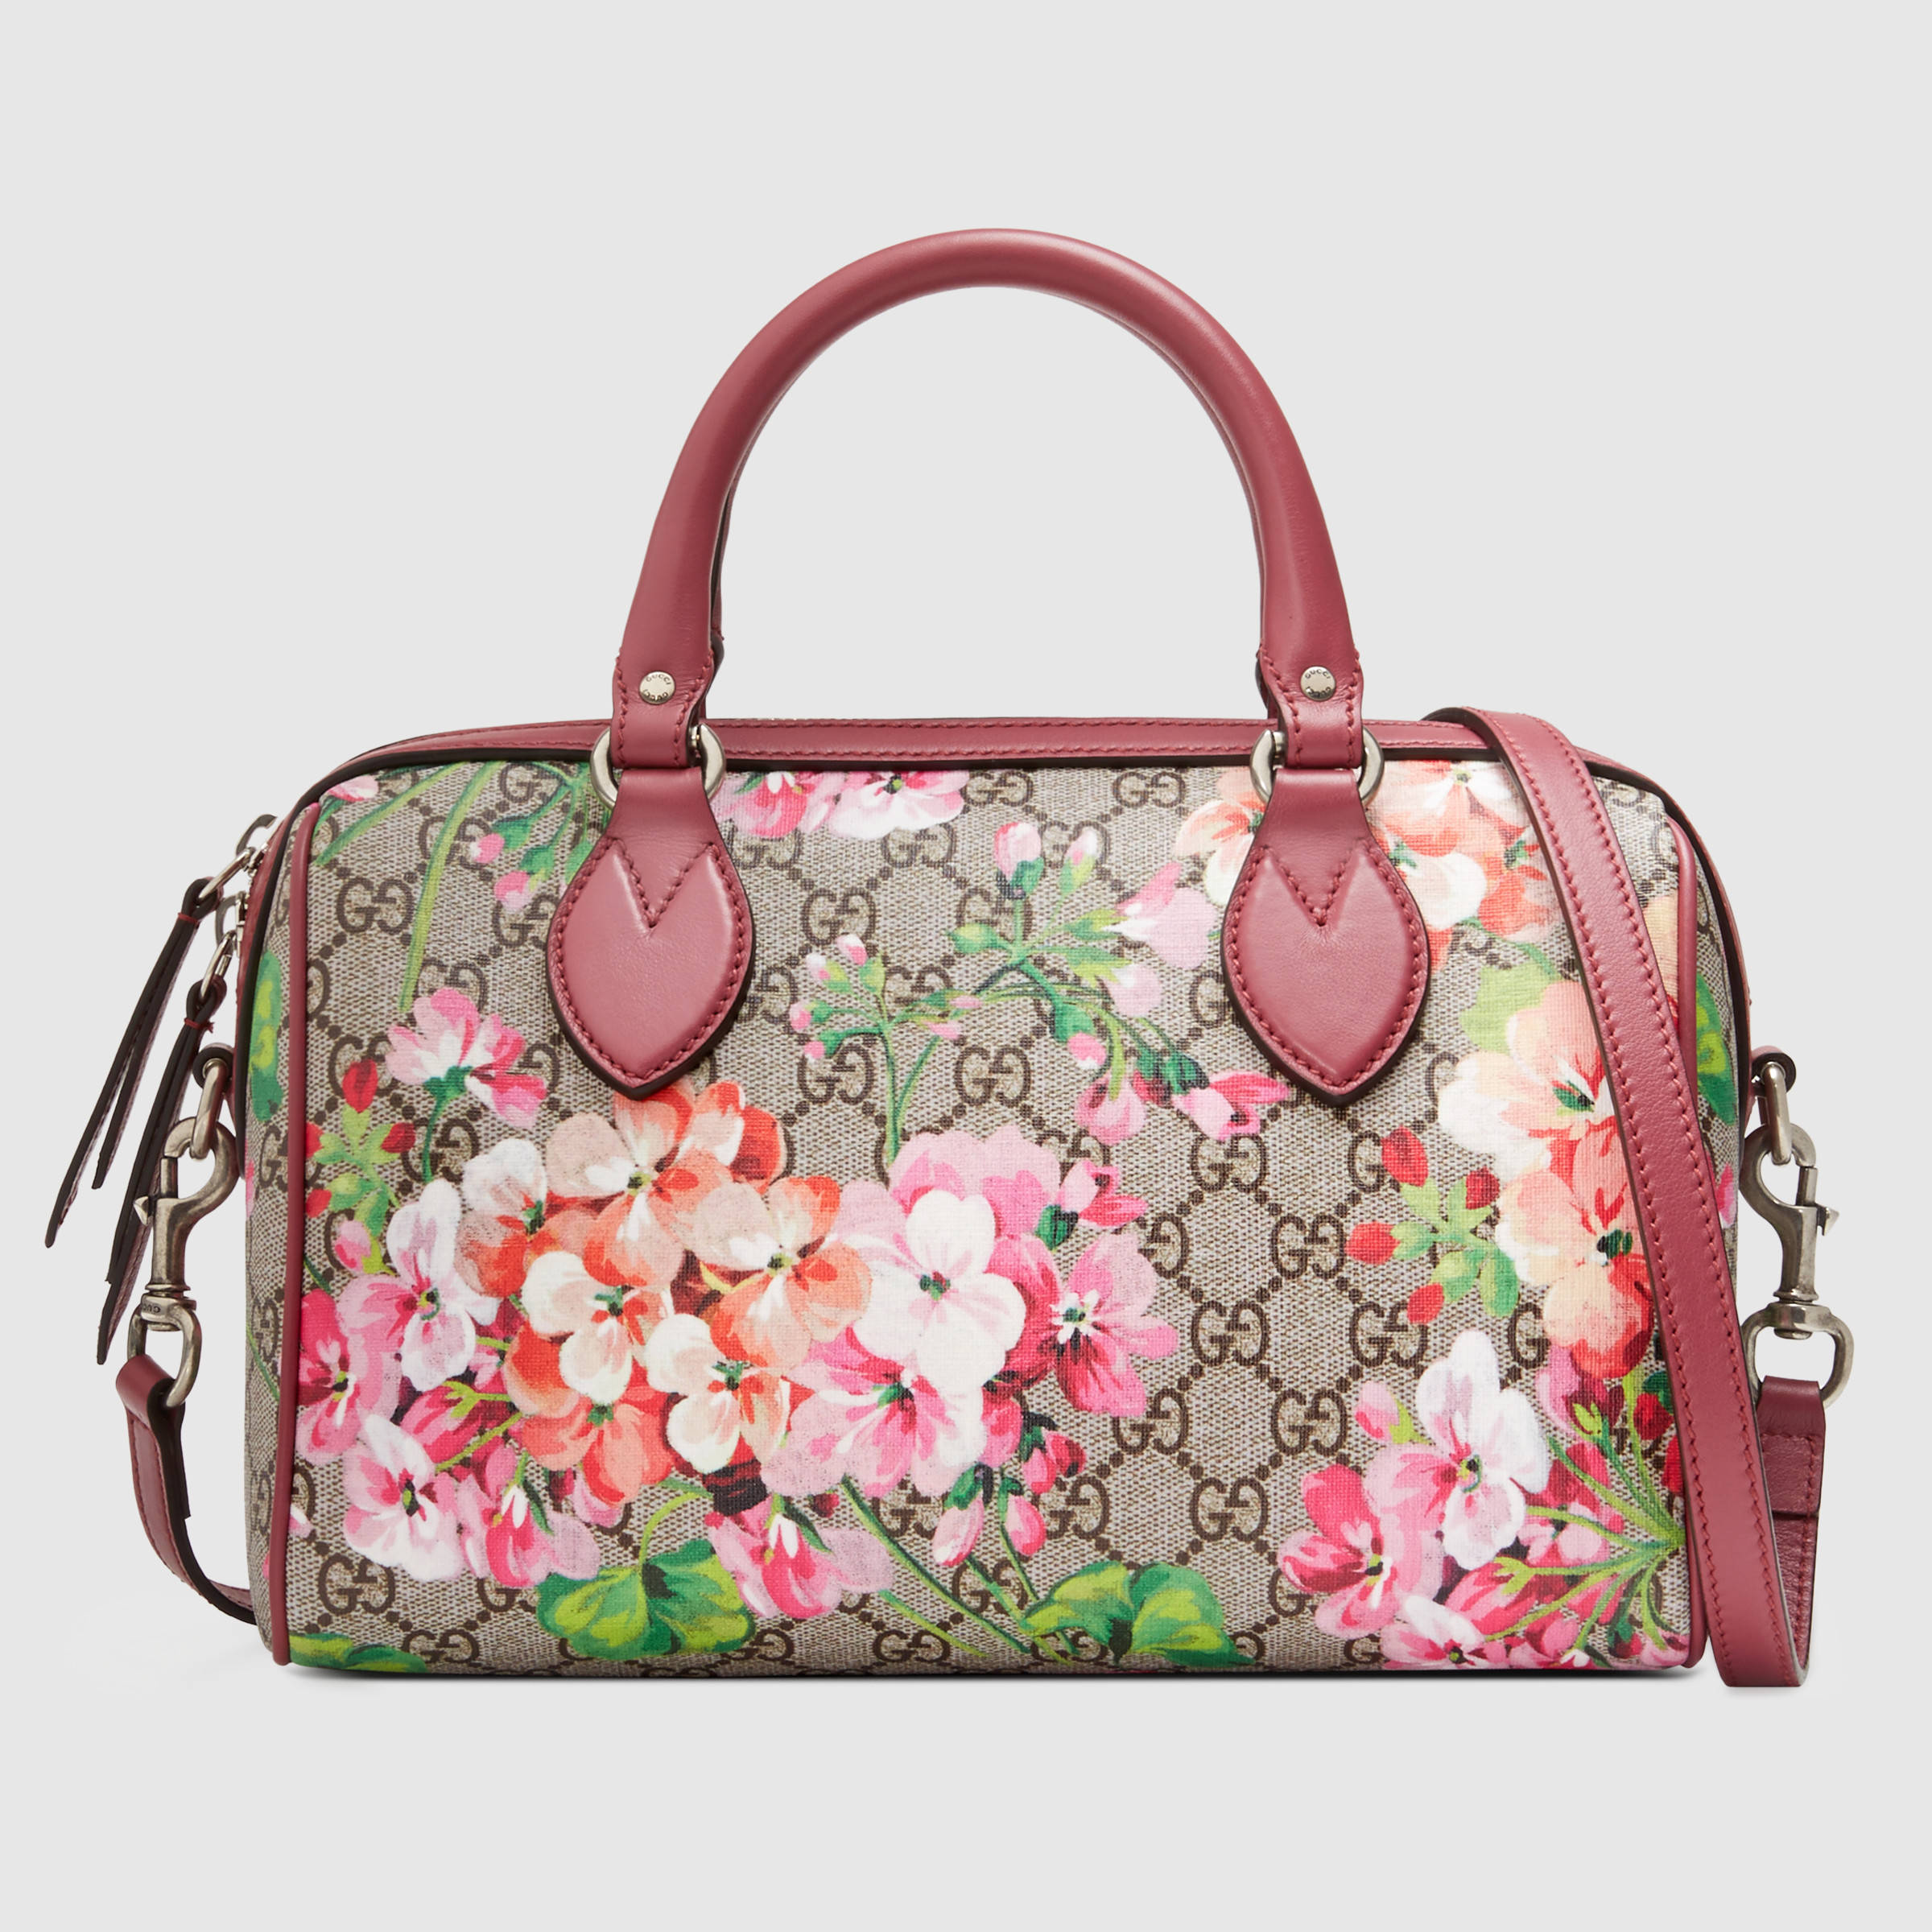 e428108f478074 409529_KU2IN_8693_001_070_0000_Light-Blooms-GG-Supreme-top-handle-bag.jpg